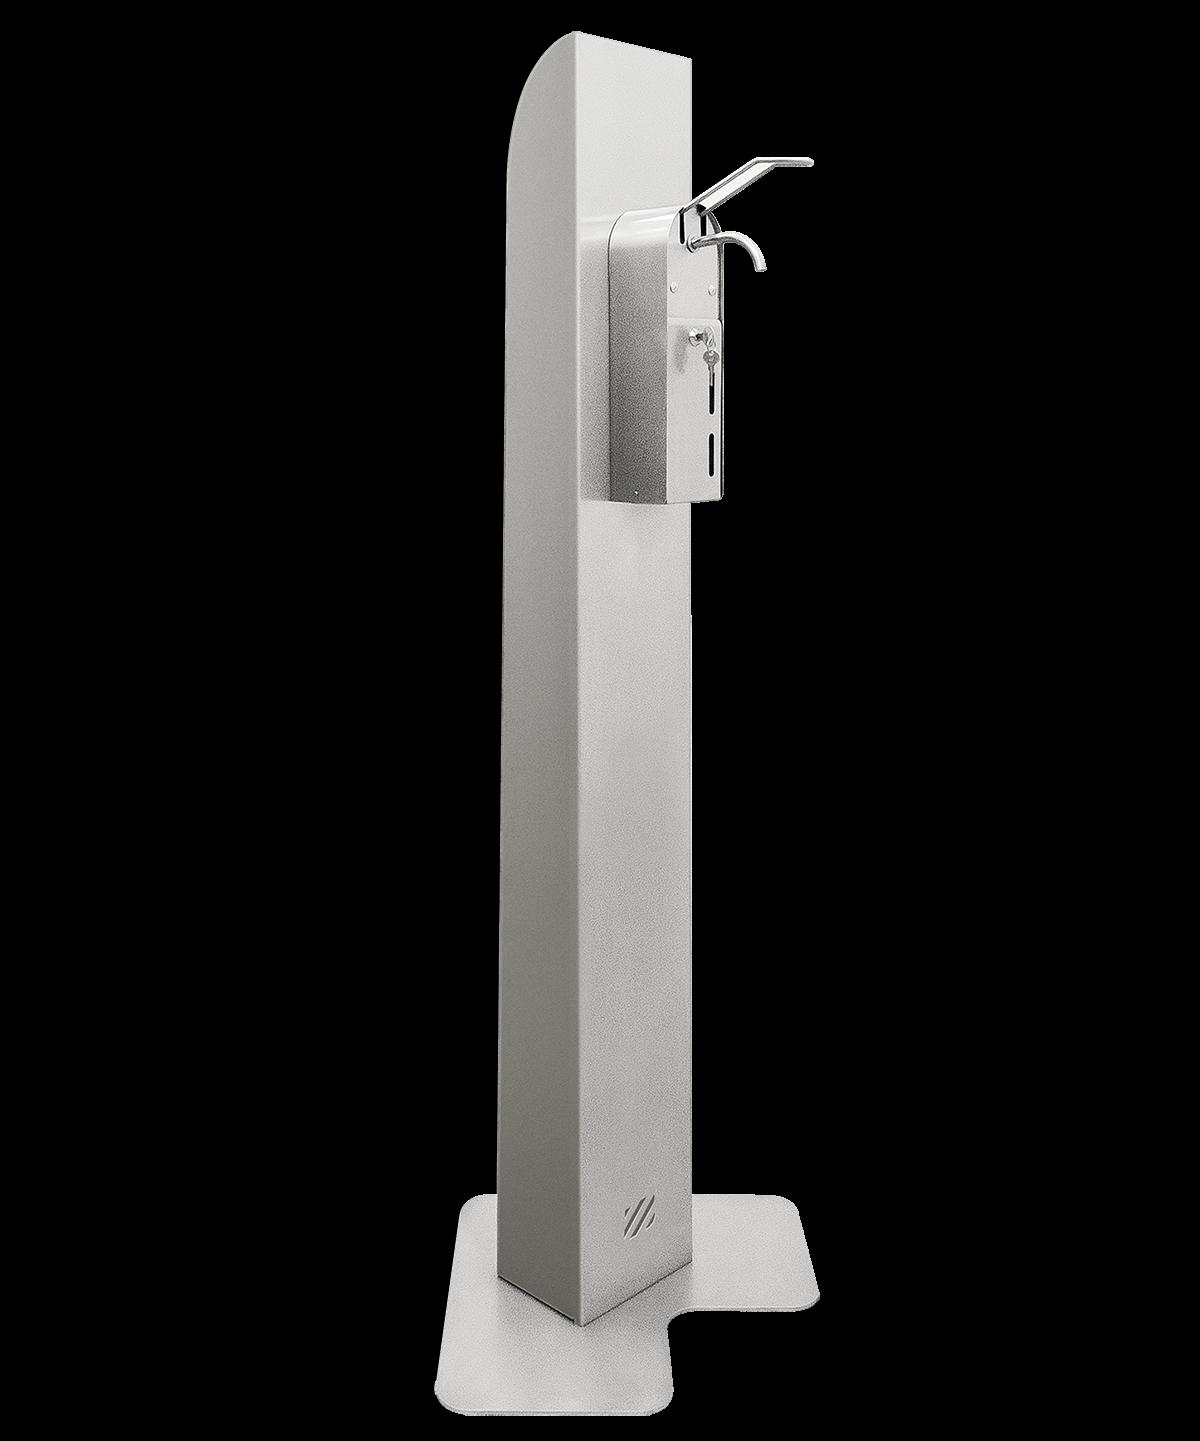 Disinfection pillar